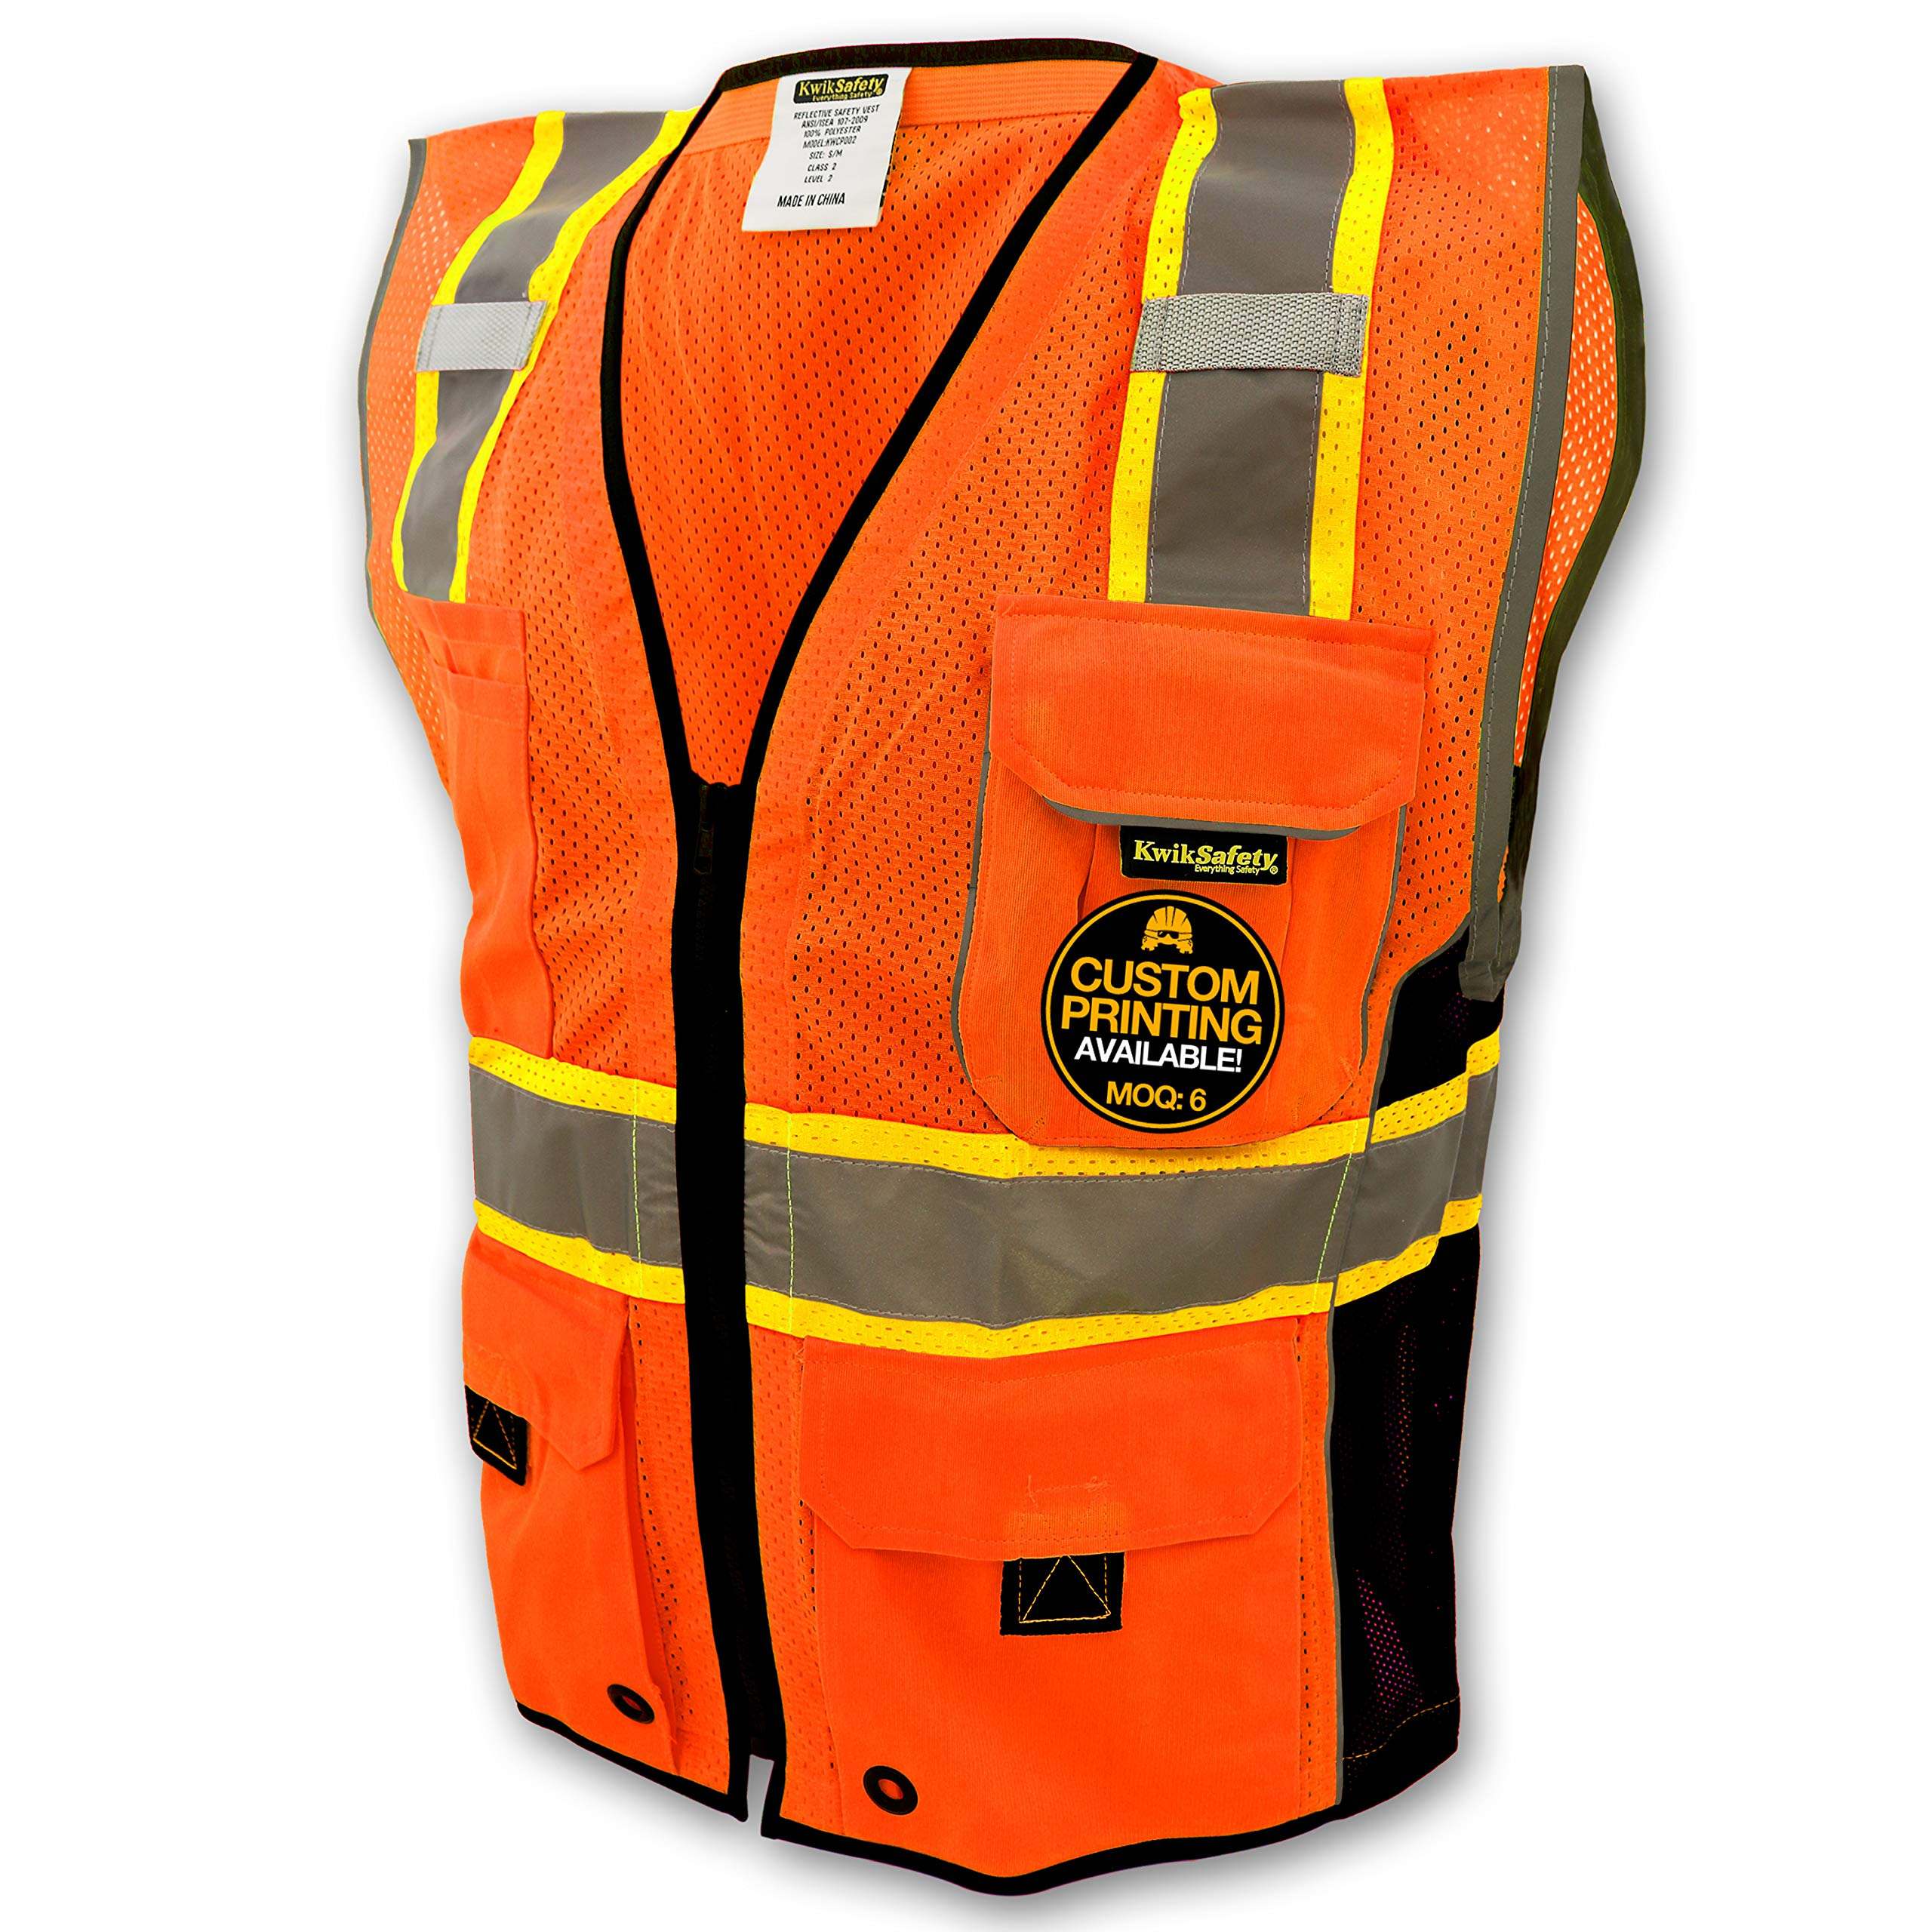 KwikSafety CLASSIC Safety Vest | Class 2 ANSI OSHA PPE | High Visibility Reflective Stripes, Heavy Duty Mesh with Pockets and Zipper | Hi-Vis Construction Work Hi-Vis Surveyor | Orange L/XL